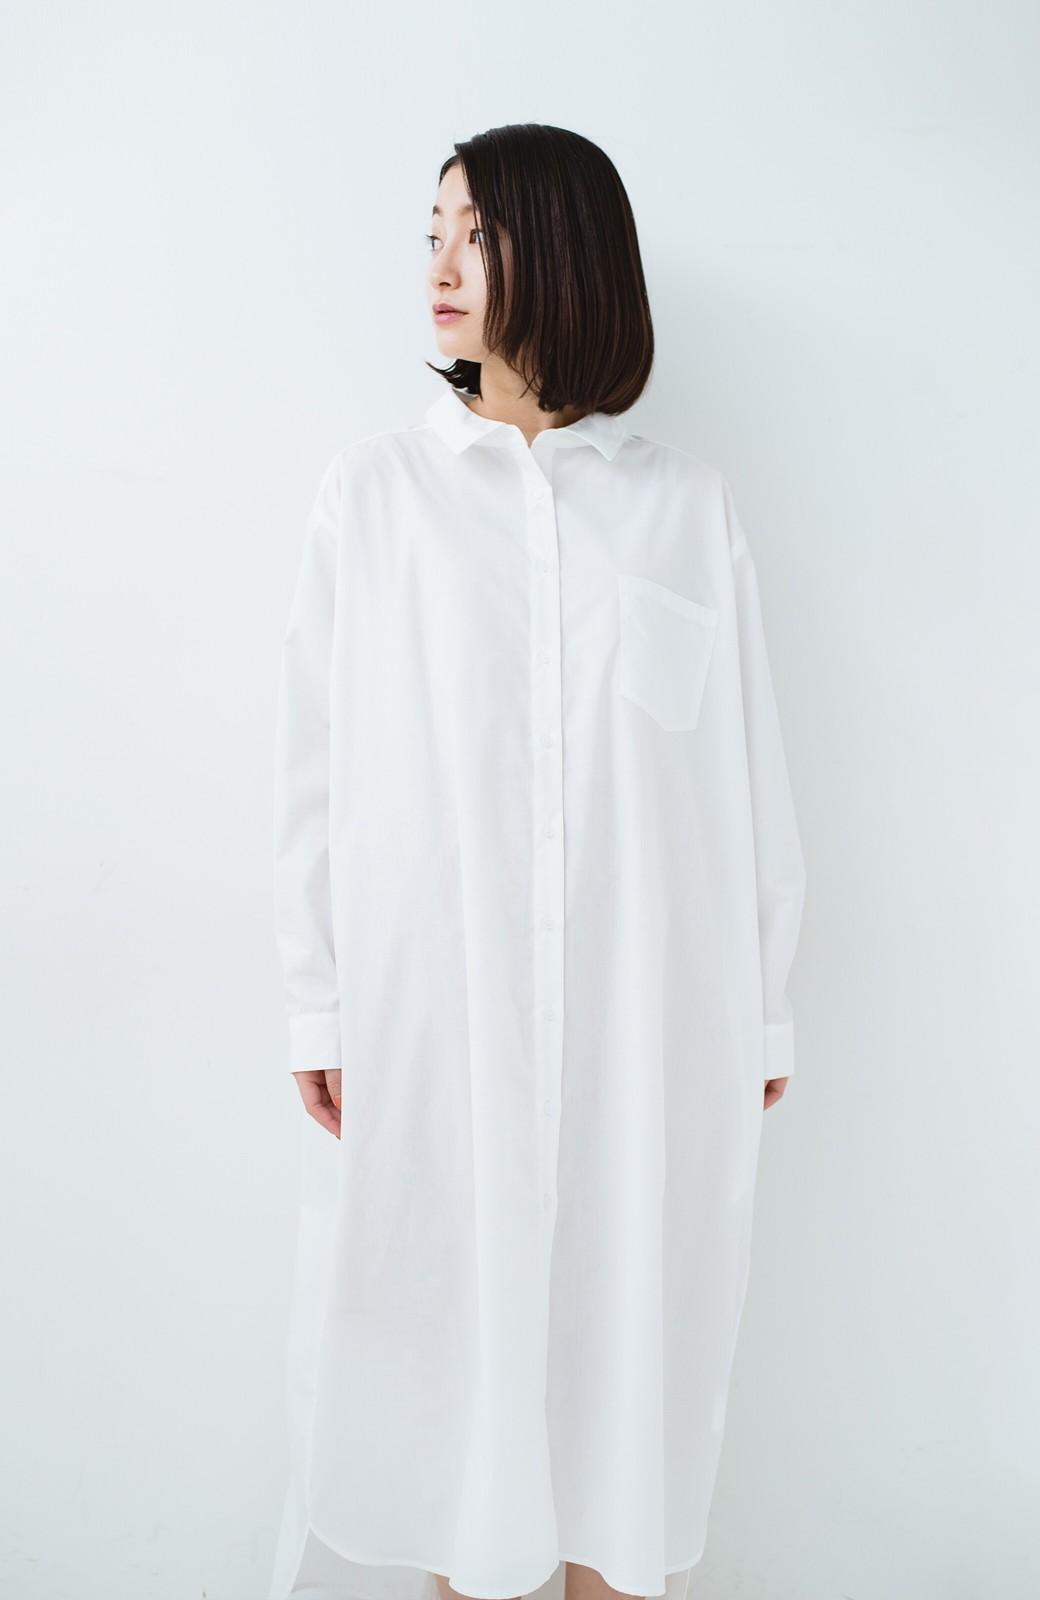 haco! 気持ちが凛と改まる リボン付きオーバーサイズシャツワンピース <ホワイト>の商品写真20